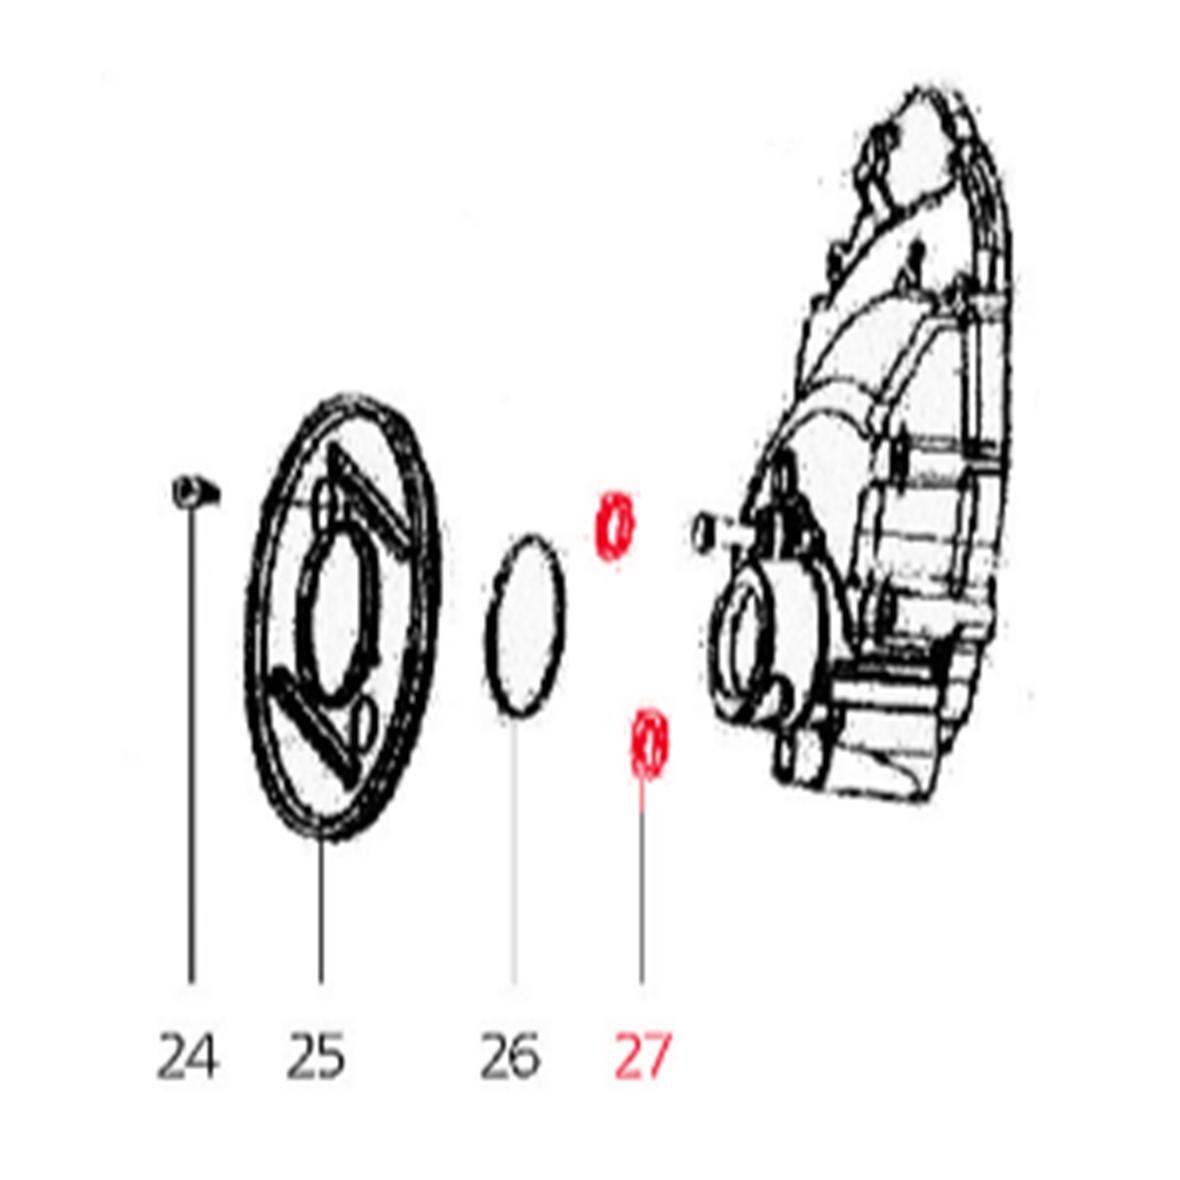 「Oリング ダスト保護プレート後輪 (スモール ) Ø i 22mm, Ø a 28 mm 厚み3mm, LMLTitle」の製品画像